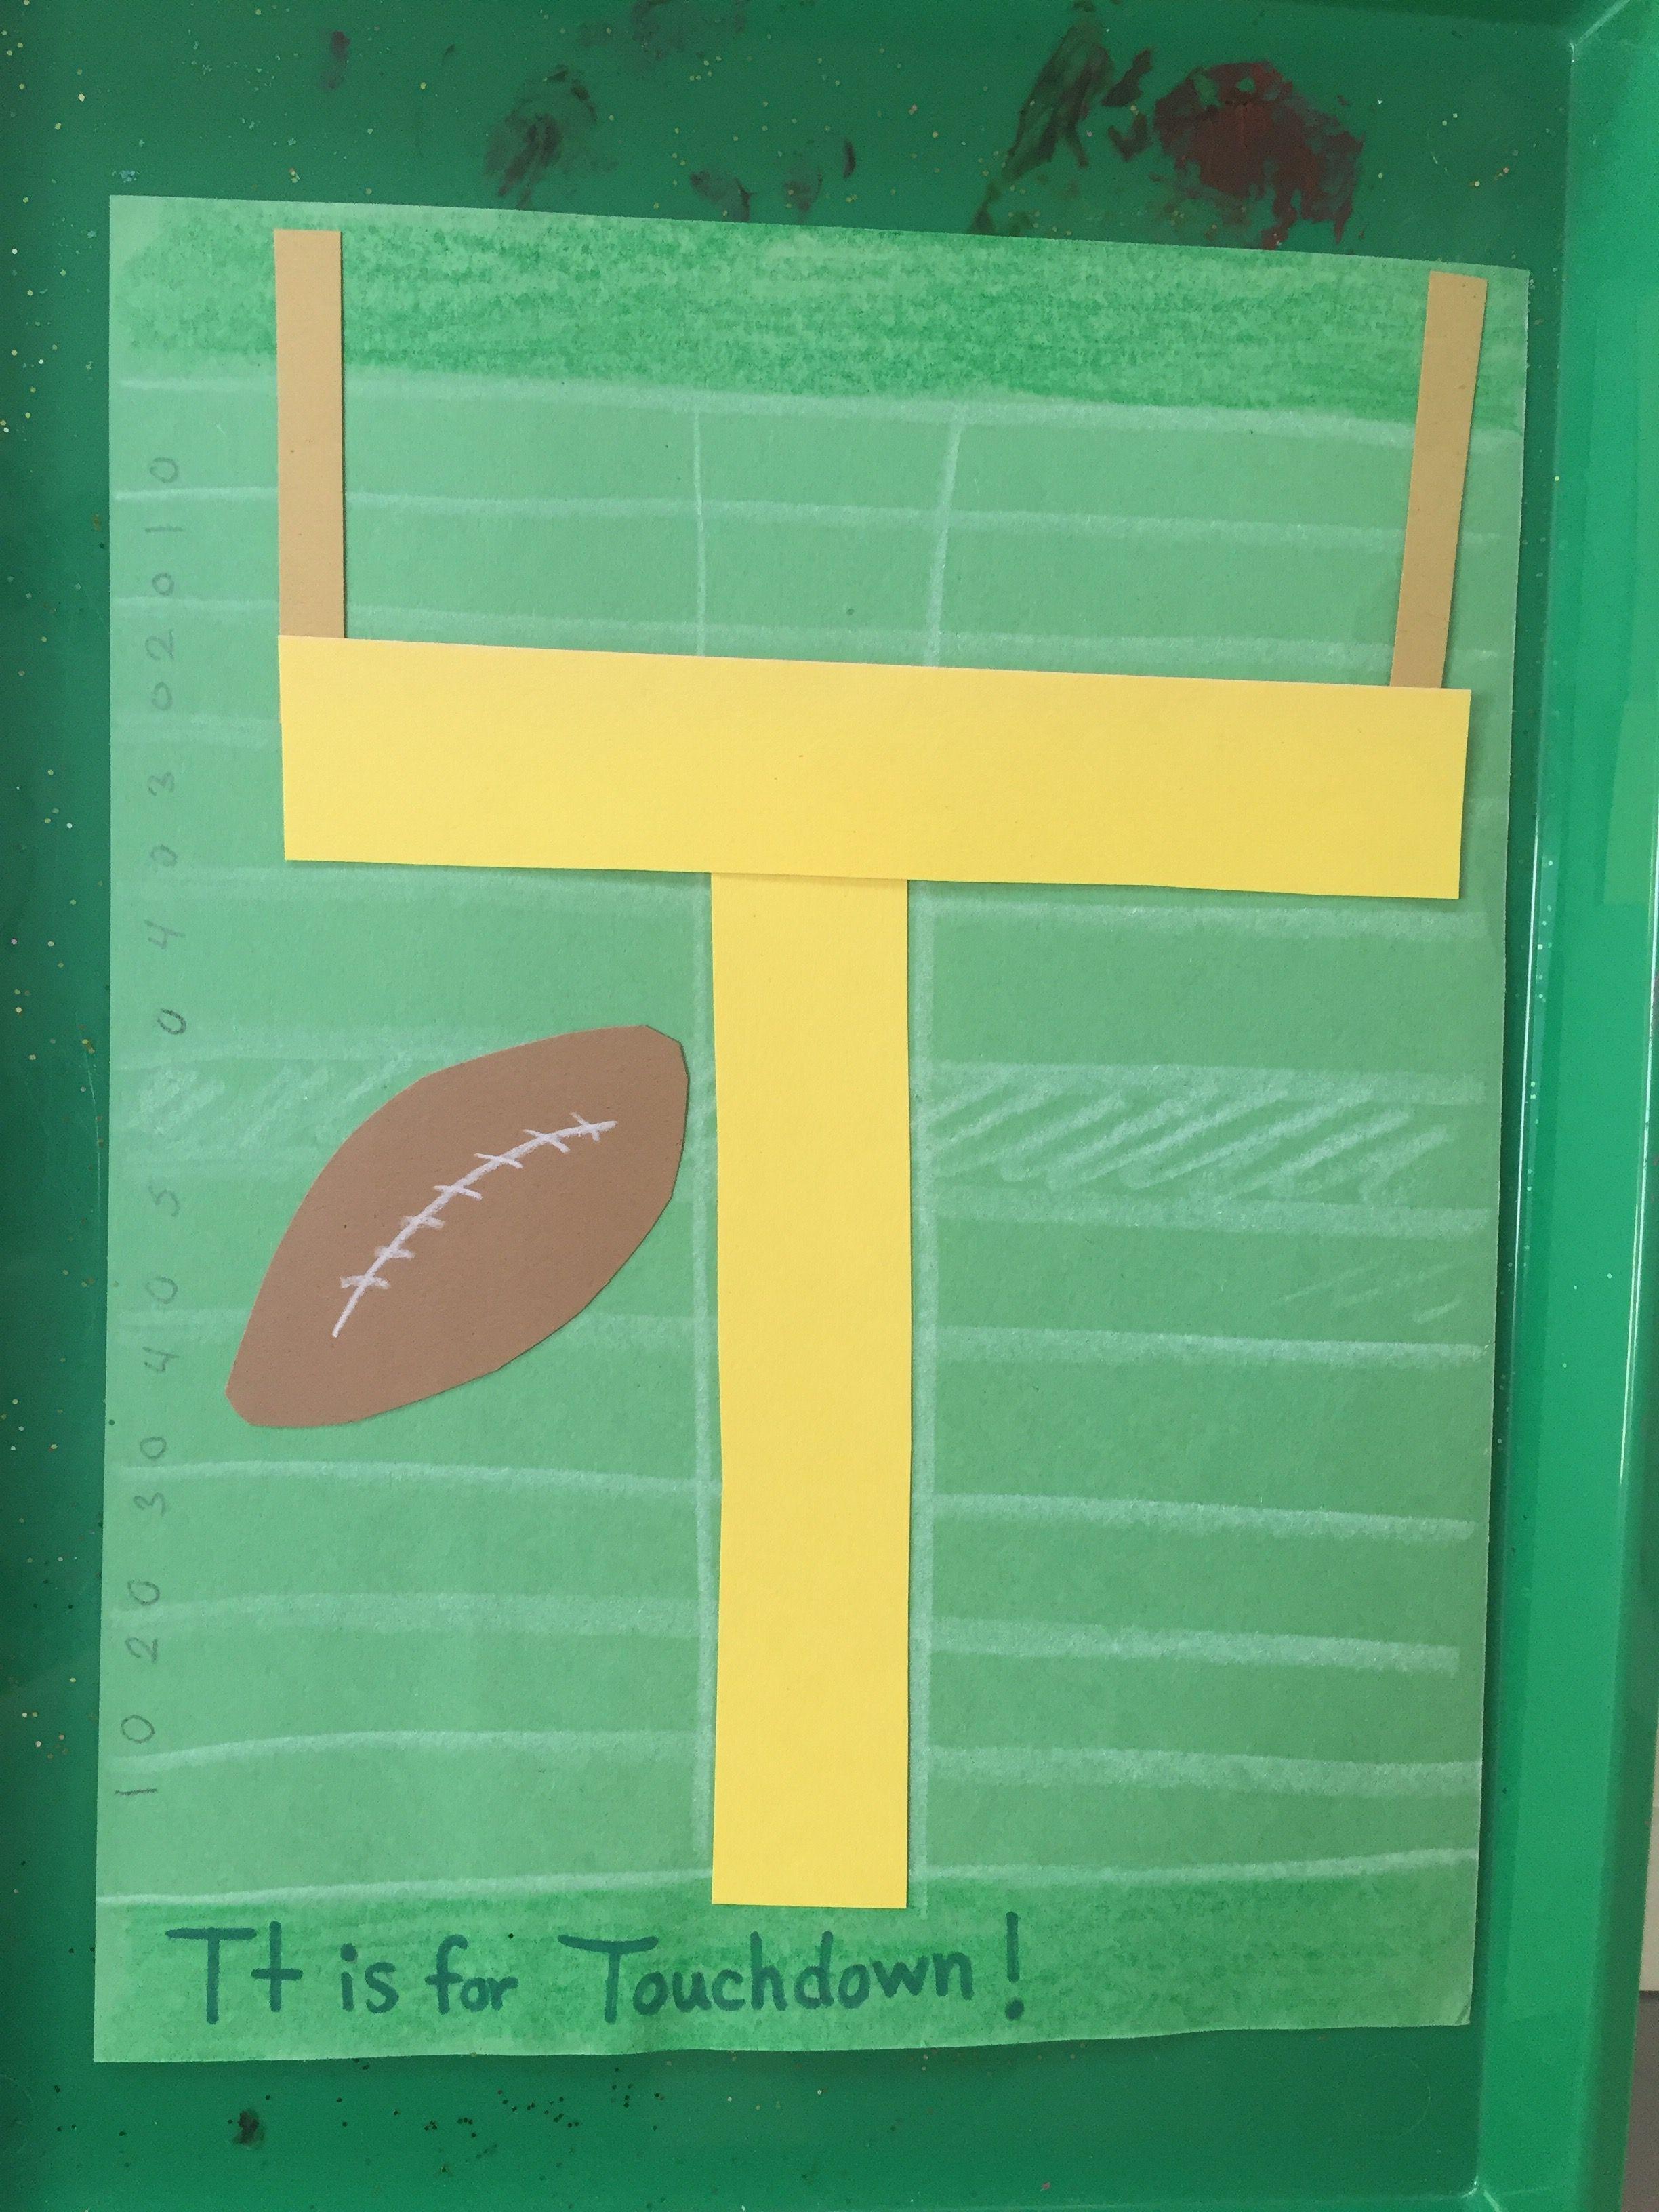 T Is For Touchdown Craft Preschool Football Theme Idea